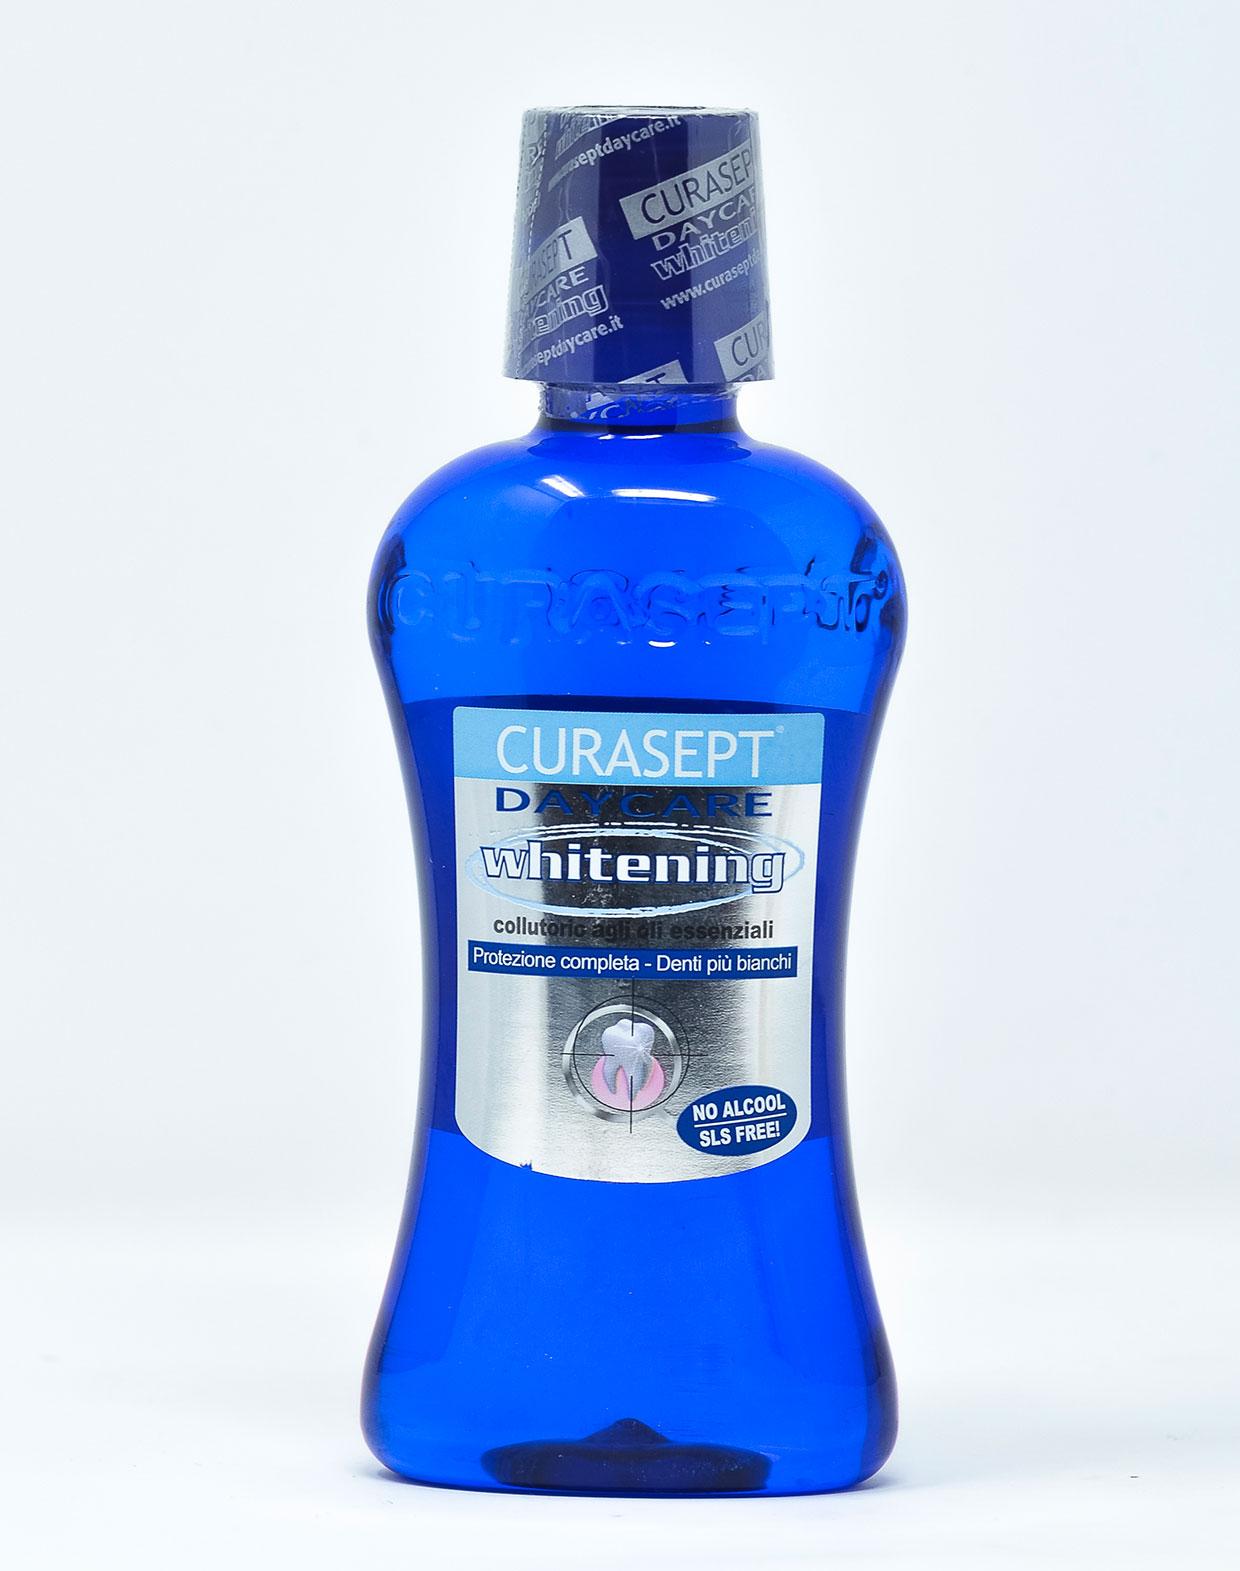 Curasept Collutorio Daycare Whitening - 250 ml